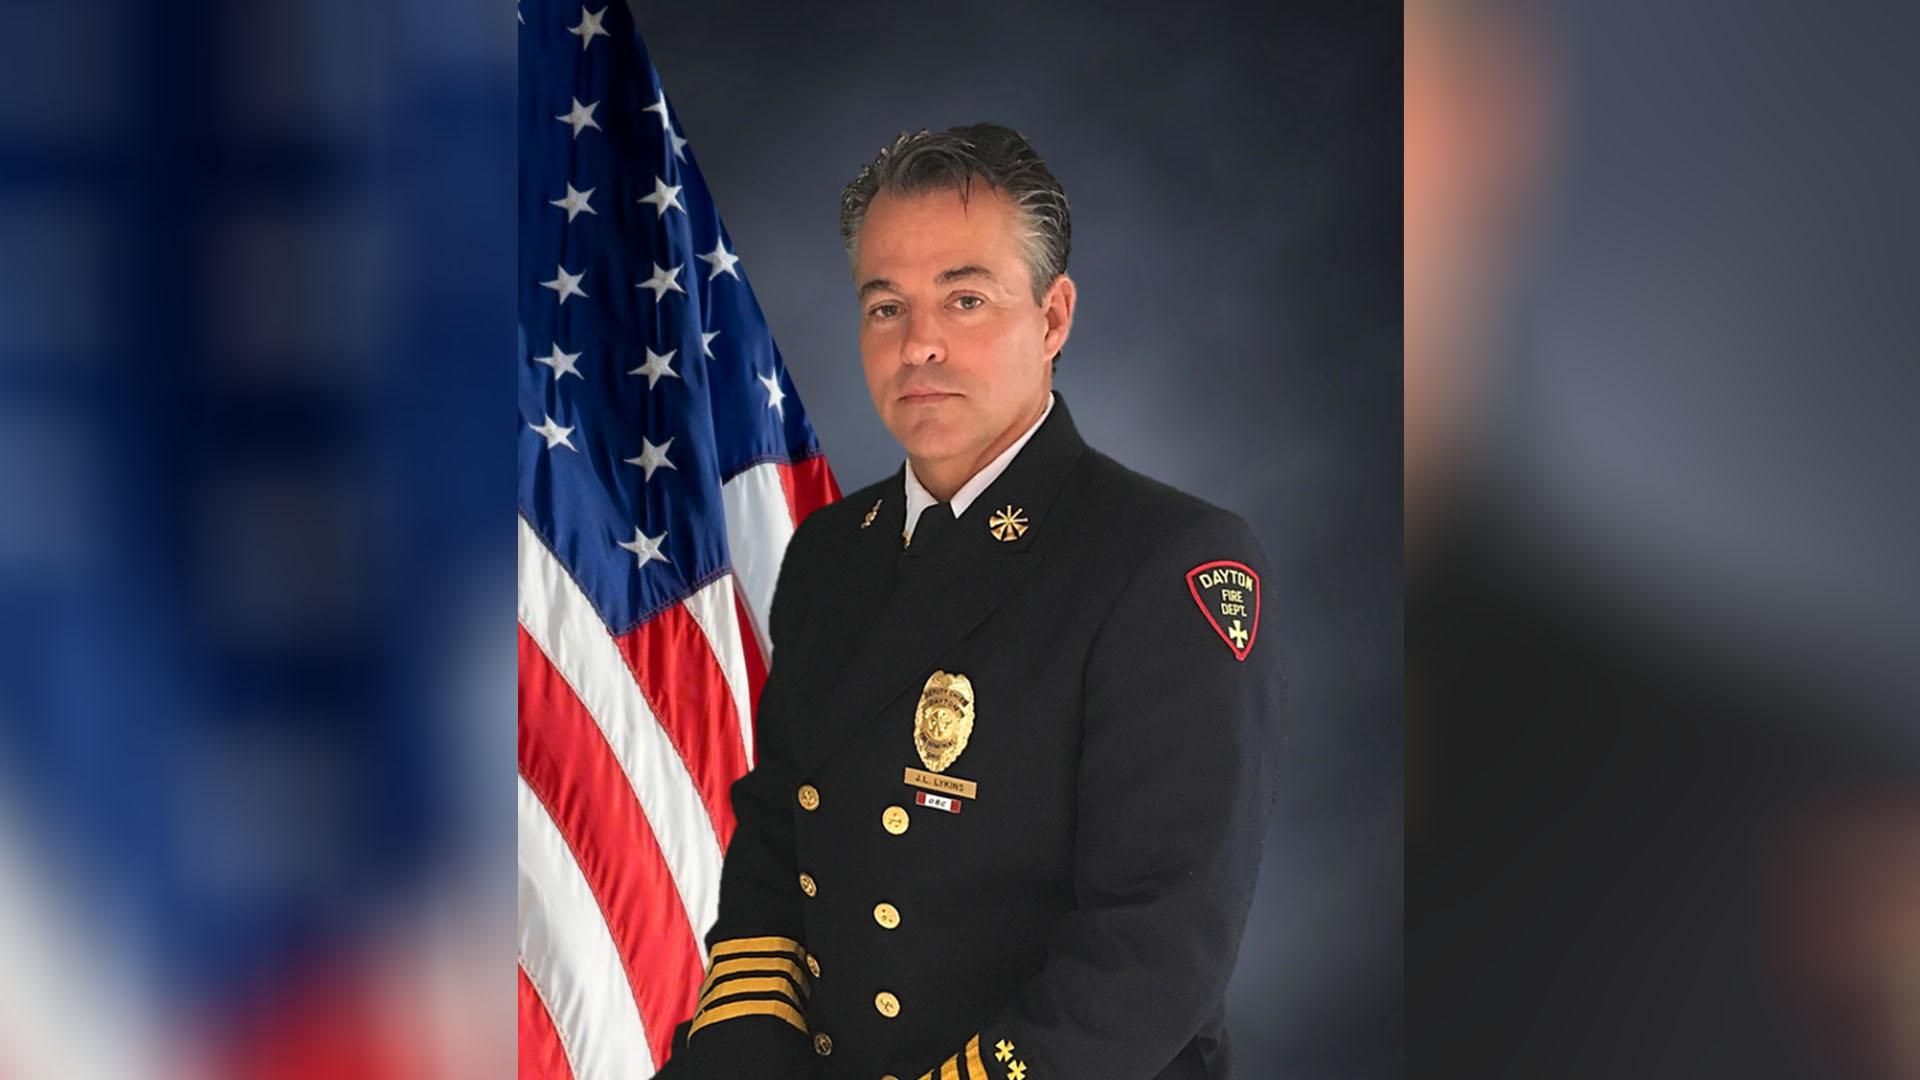 Dayton Fire Chief Lykins